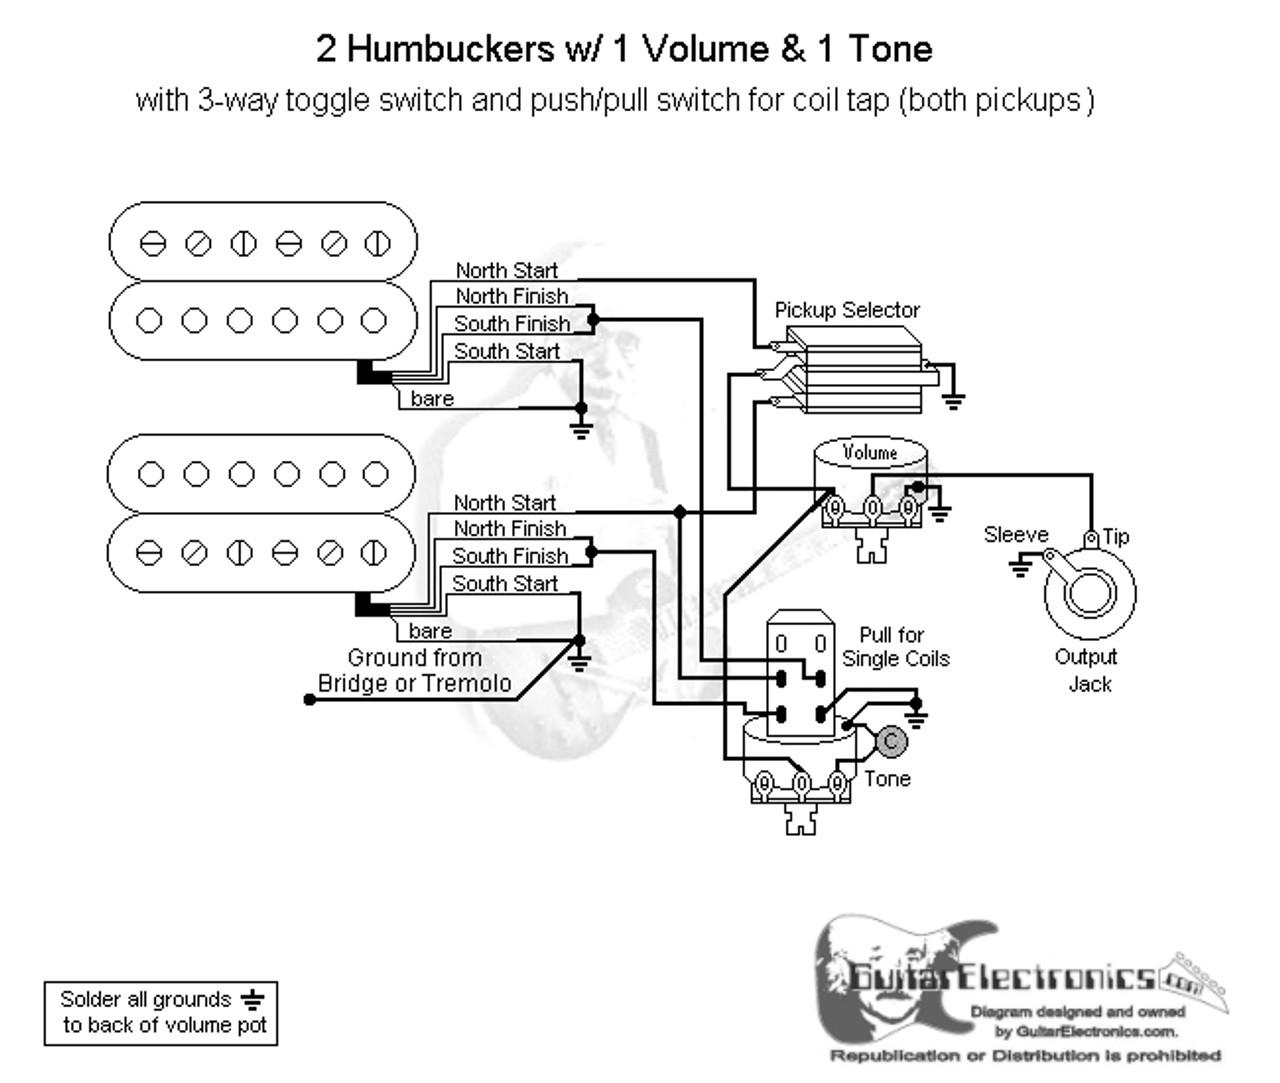 wiring diagrams single humbucker guitar pick up tone volume and2 humbuckers 3 way toggle switch 1 [ 1280 x 1083 Pixel ]